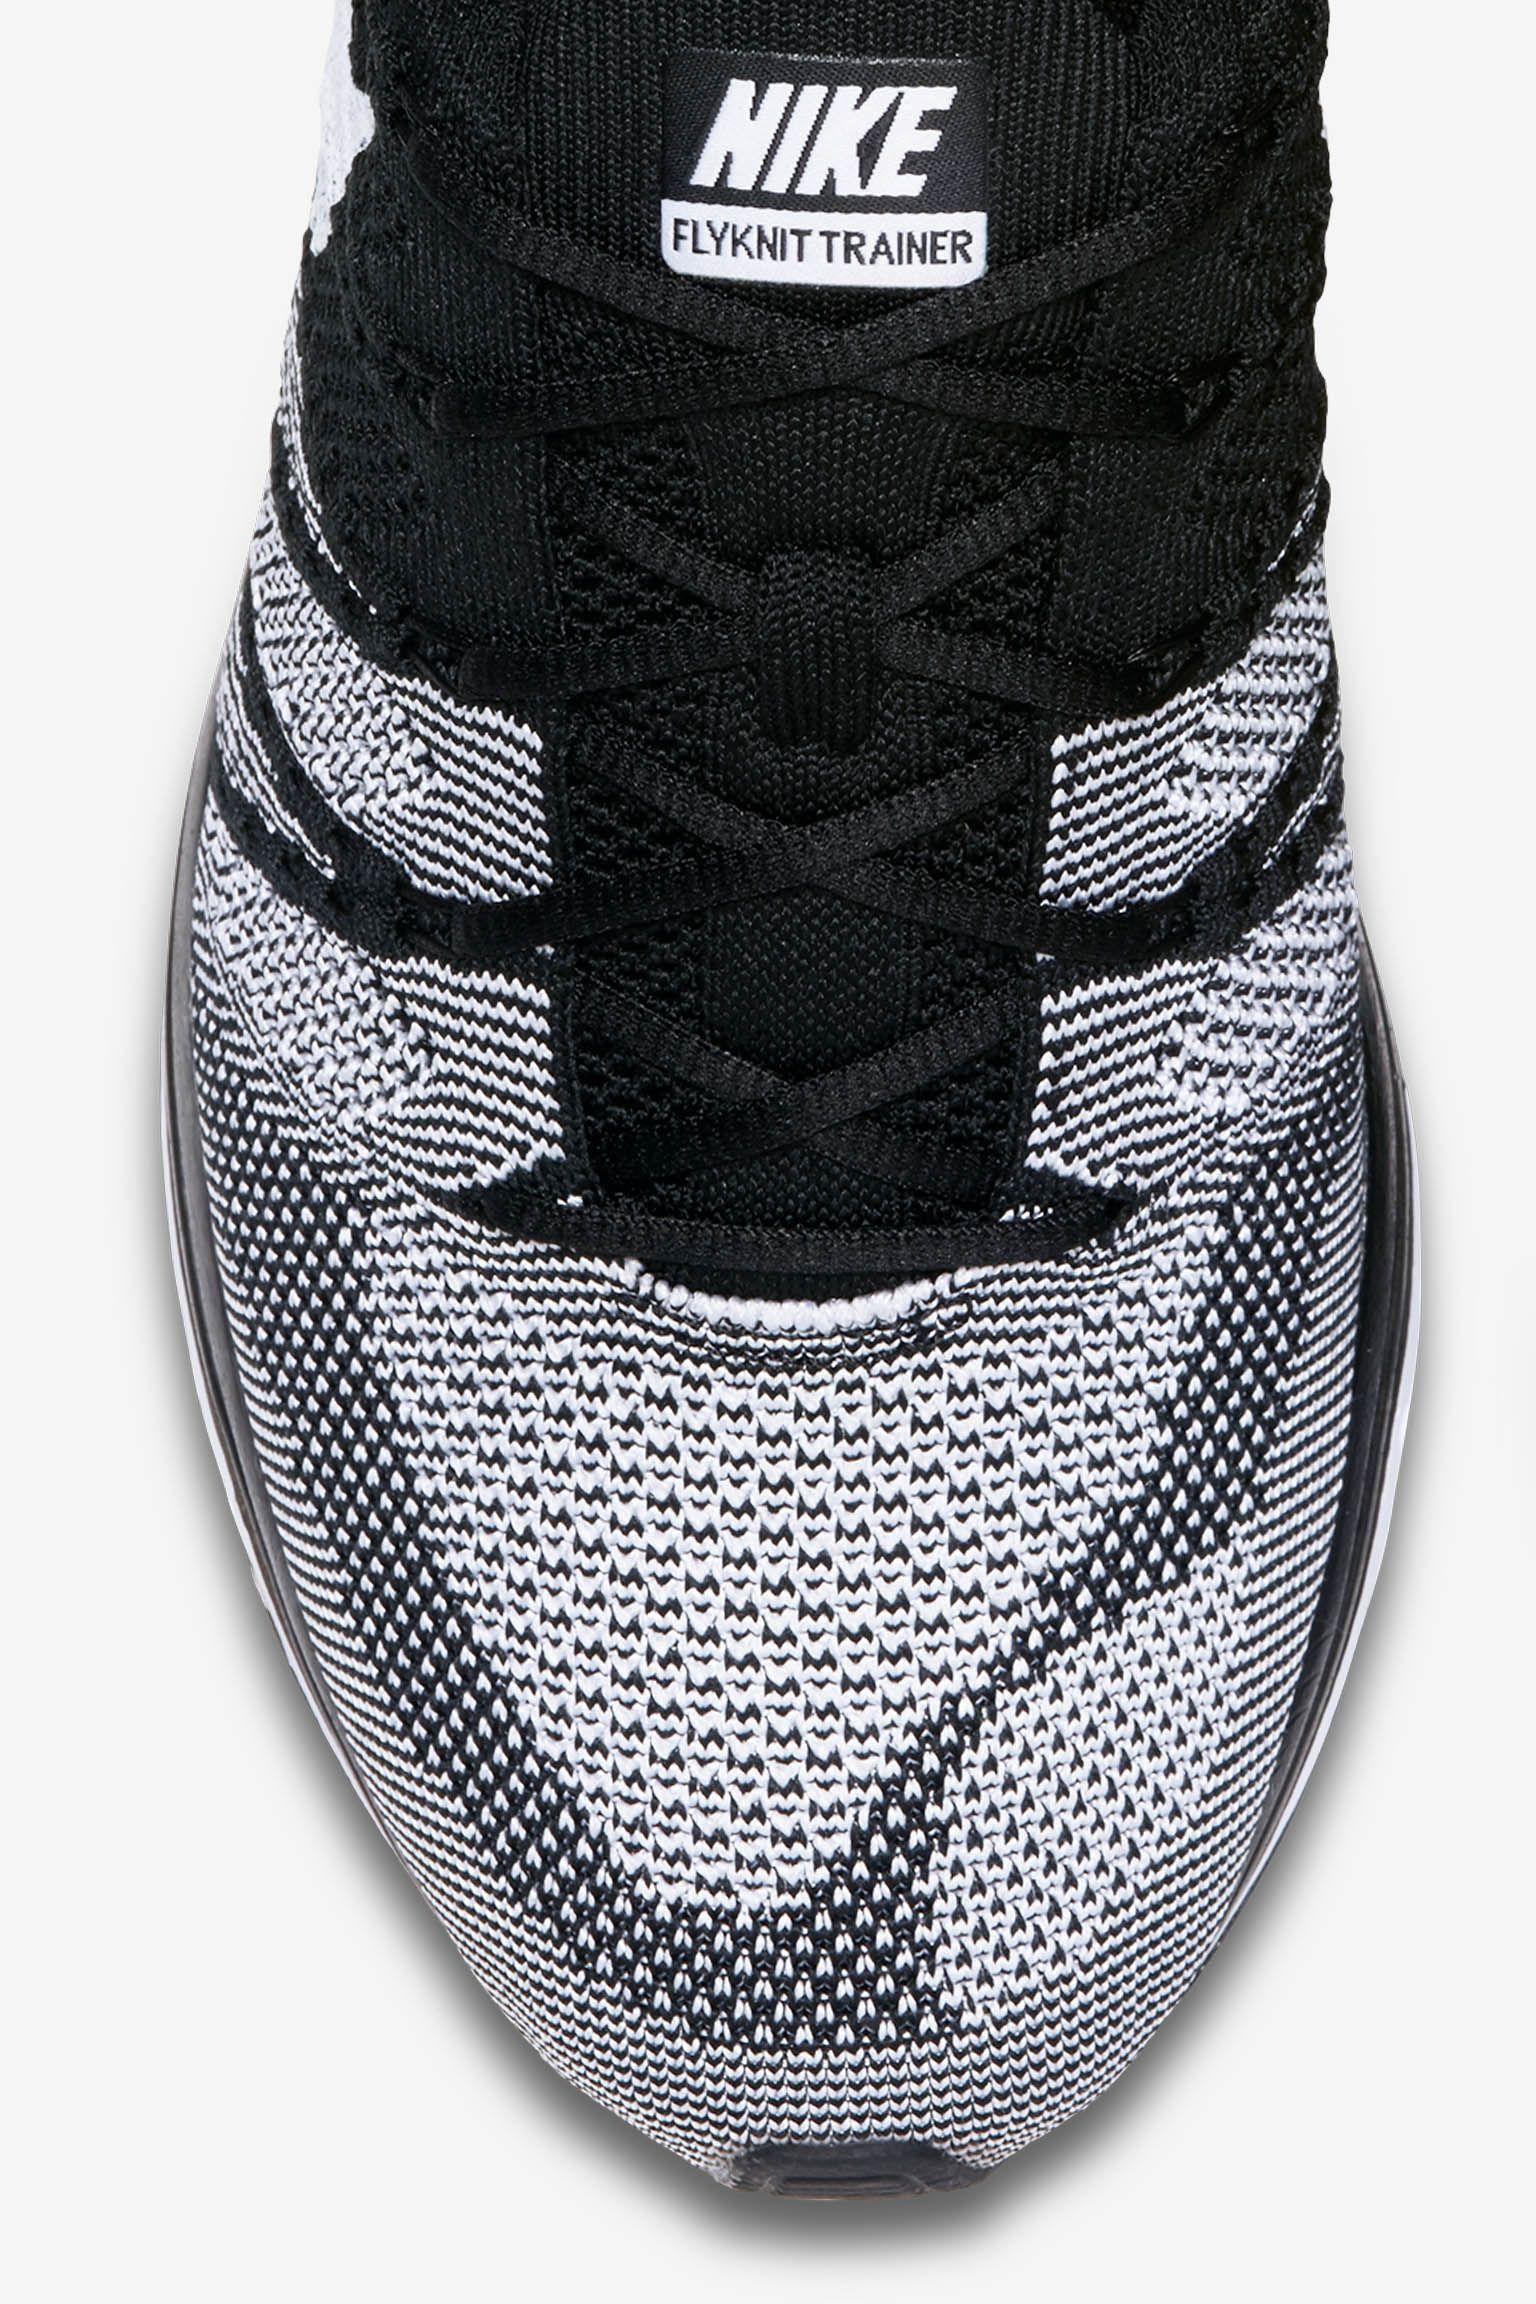 Nike Flyknit Trainer 'Black & White' Release Date